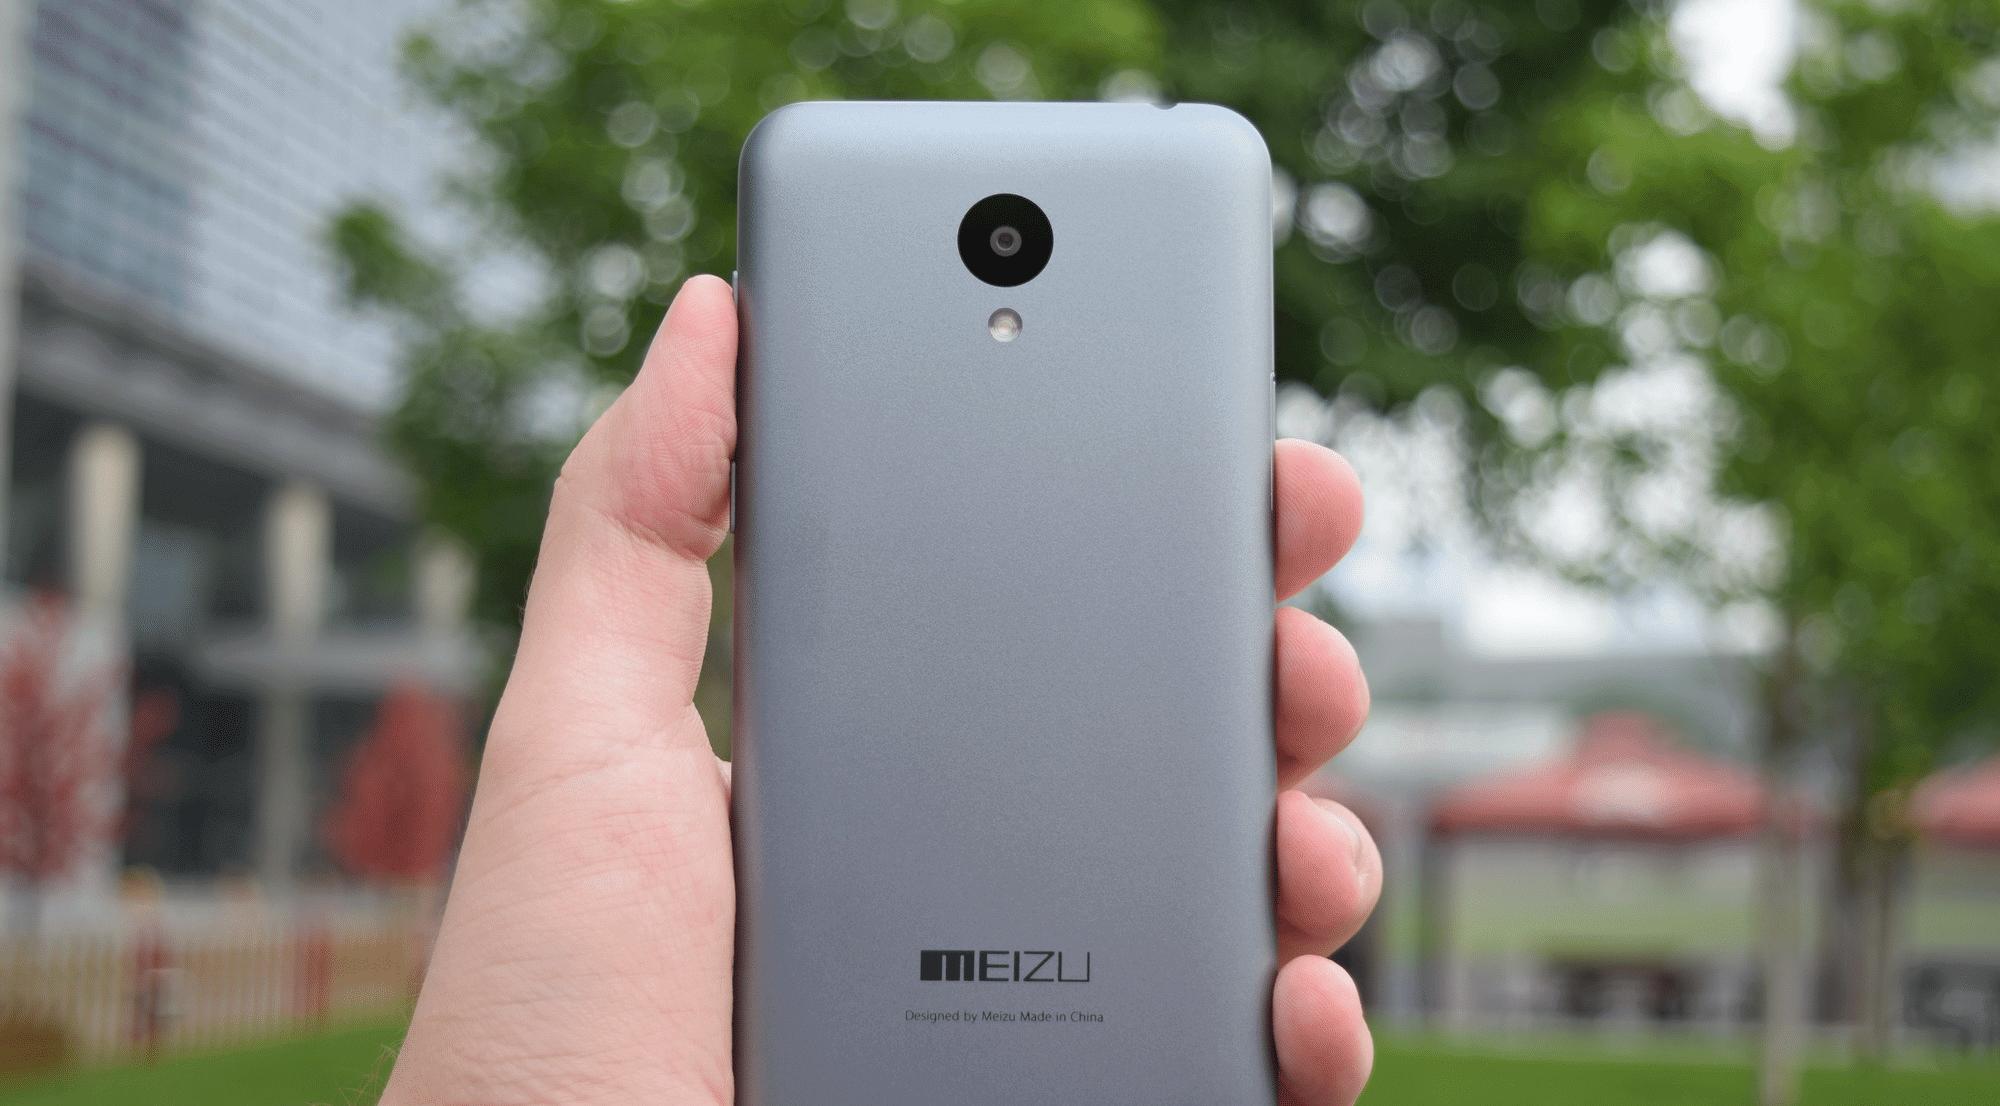 Update Meizu M2 Mini To Android 7.1.2 Nougat Via Lineage OS 14.1 Custom ROM 1